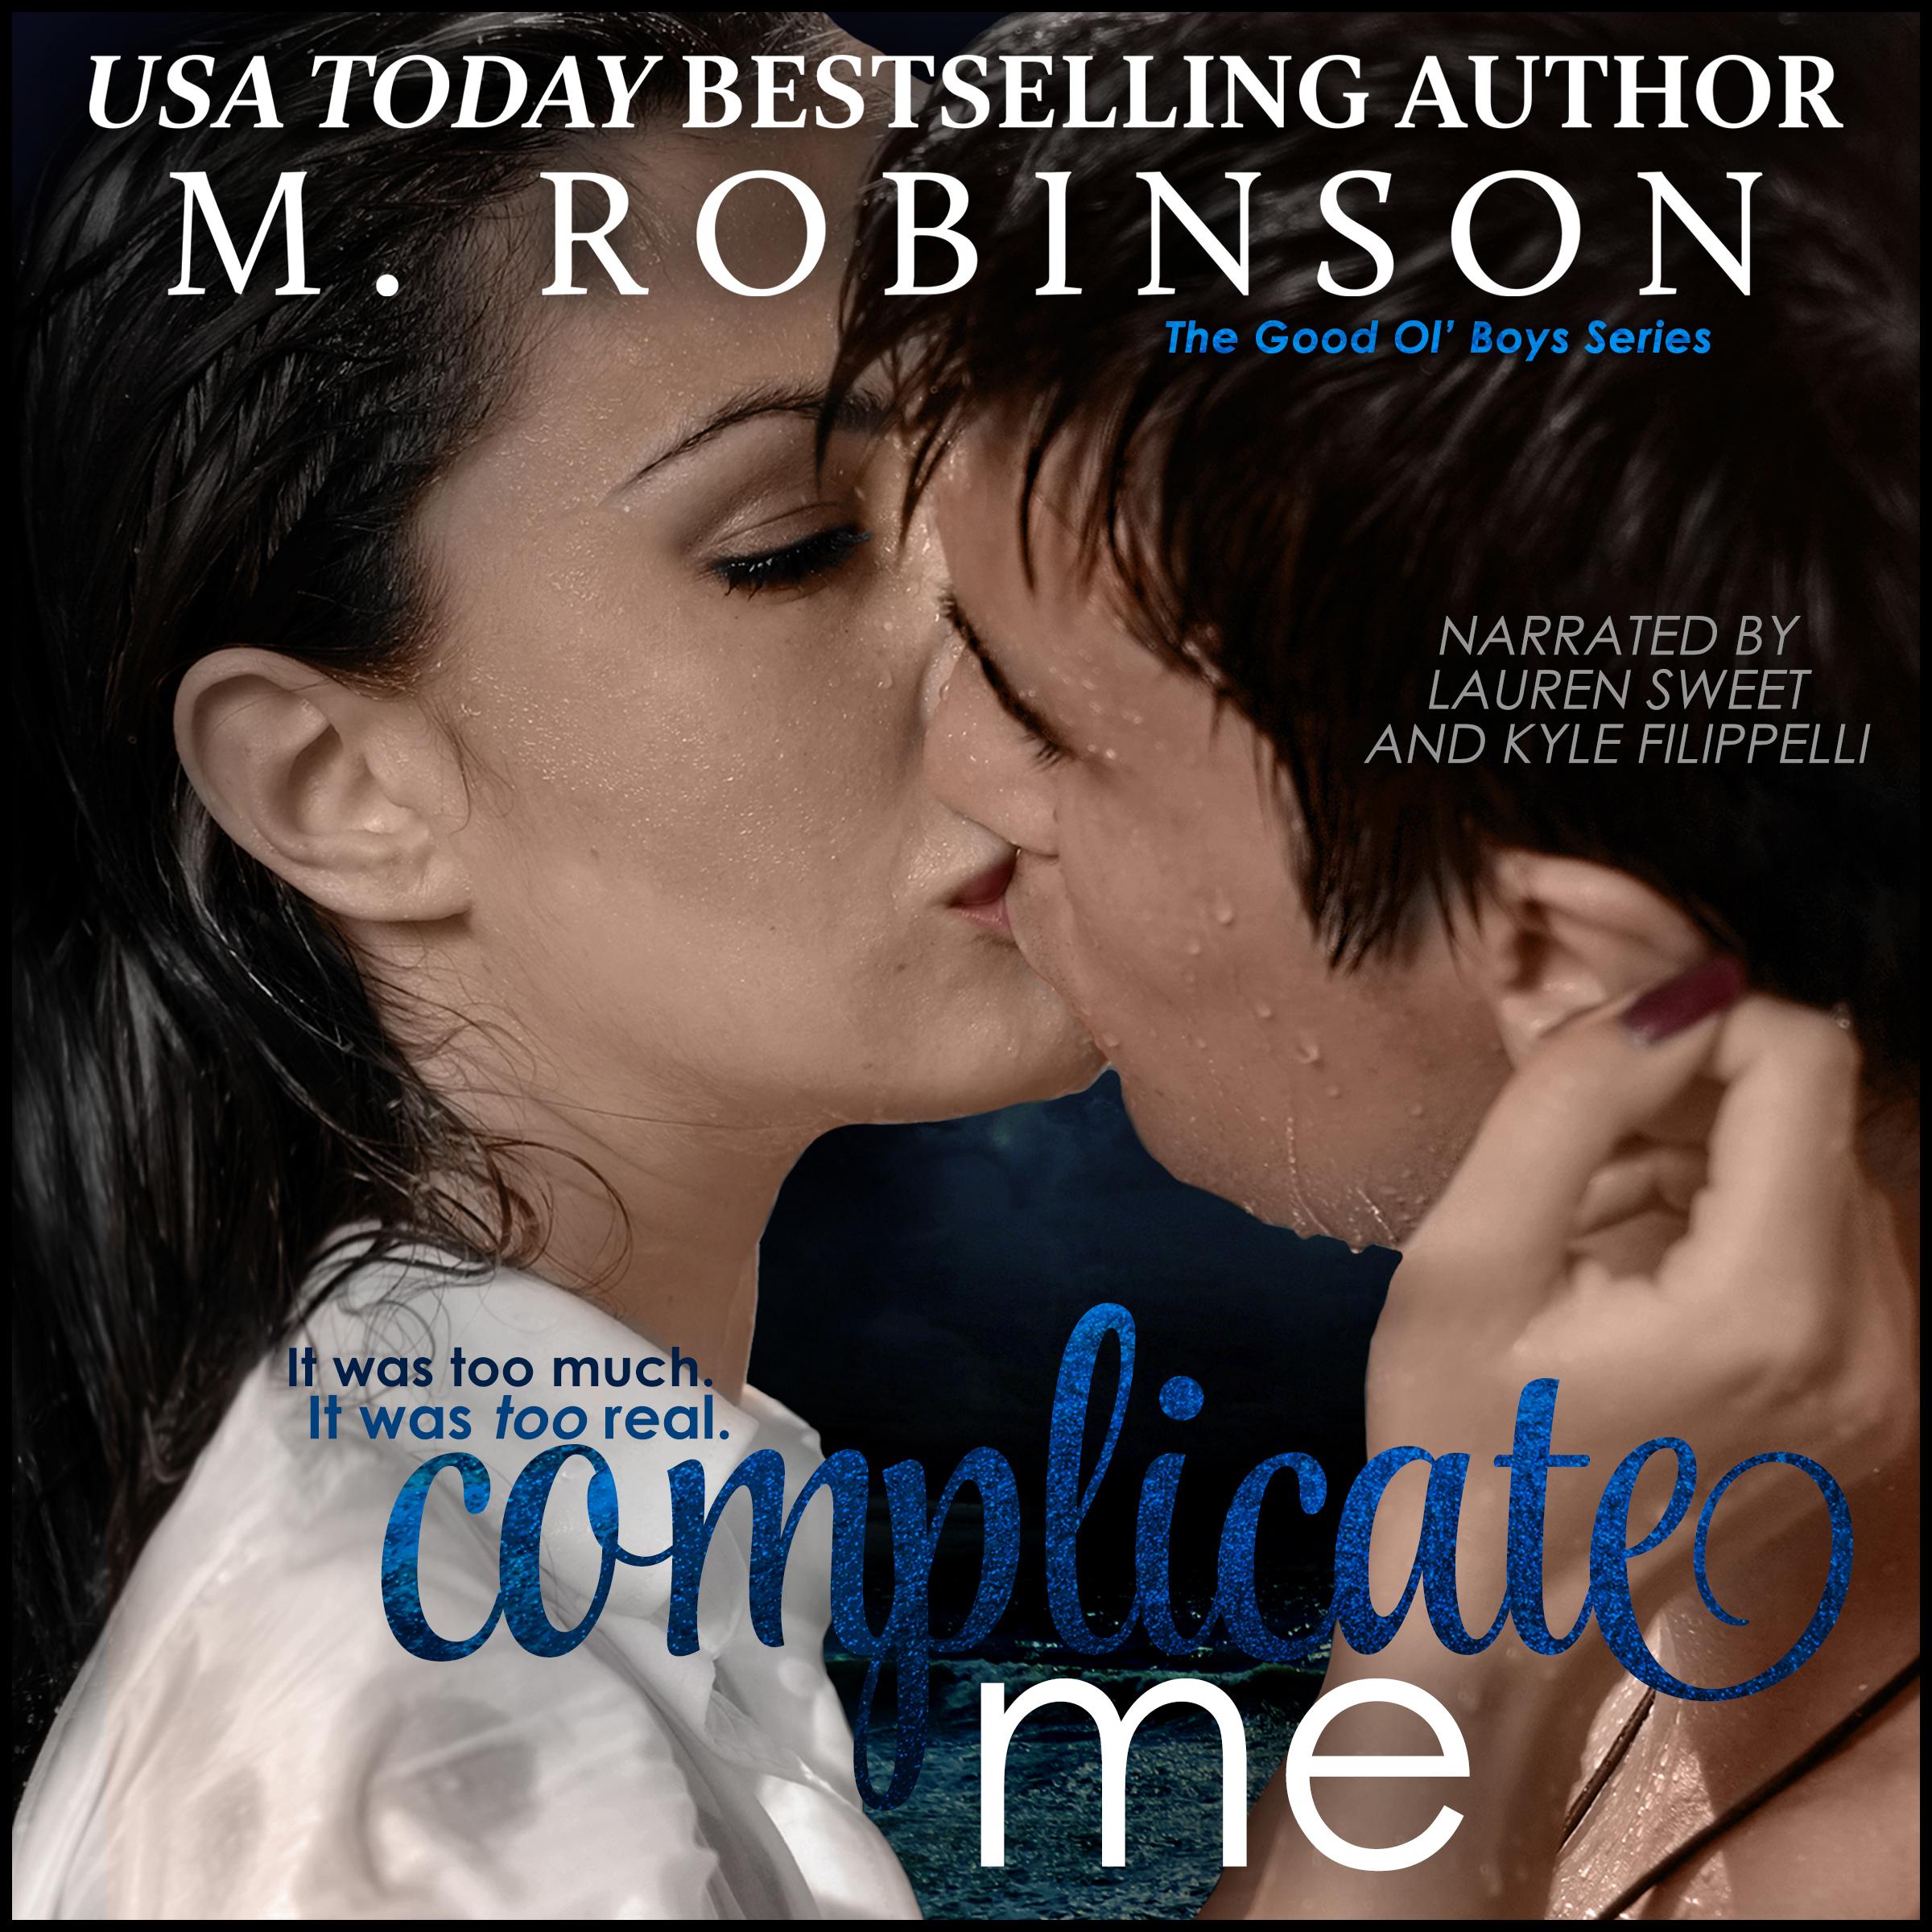 MRobinson_ComplicateMe_AudioUSAToday.jpg